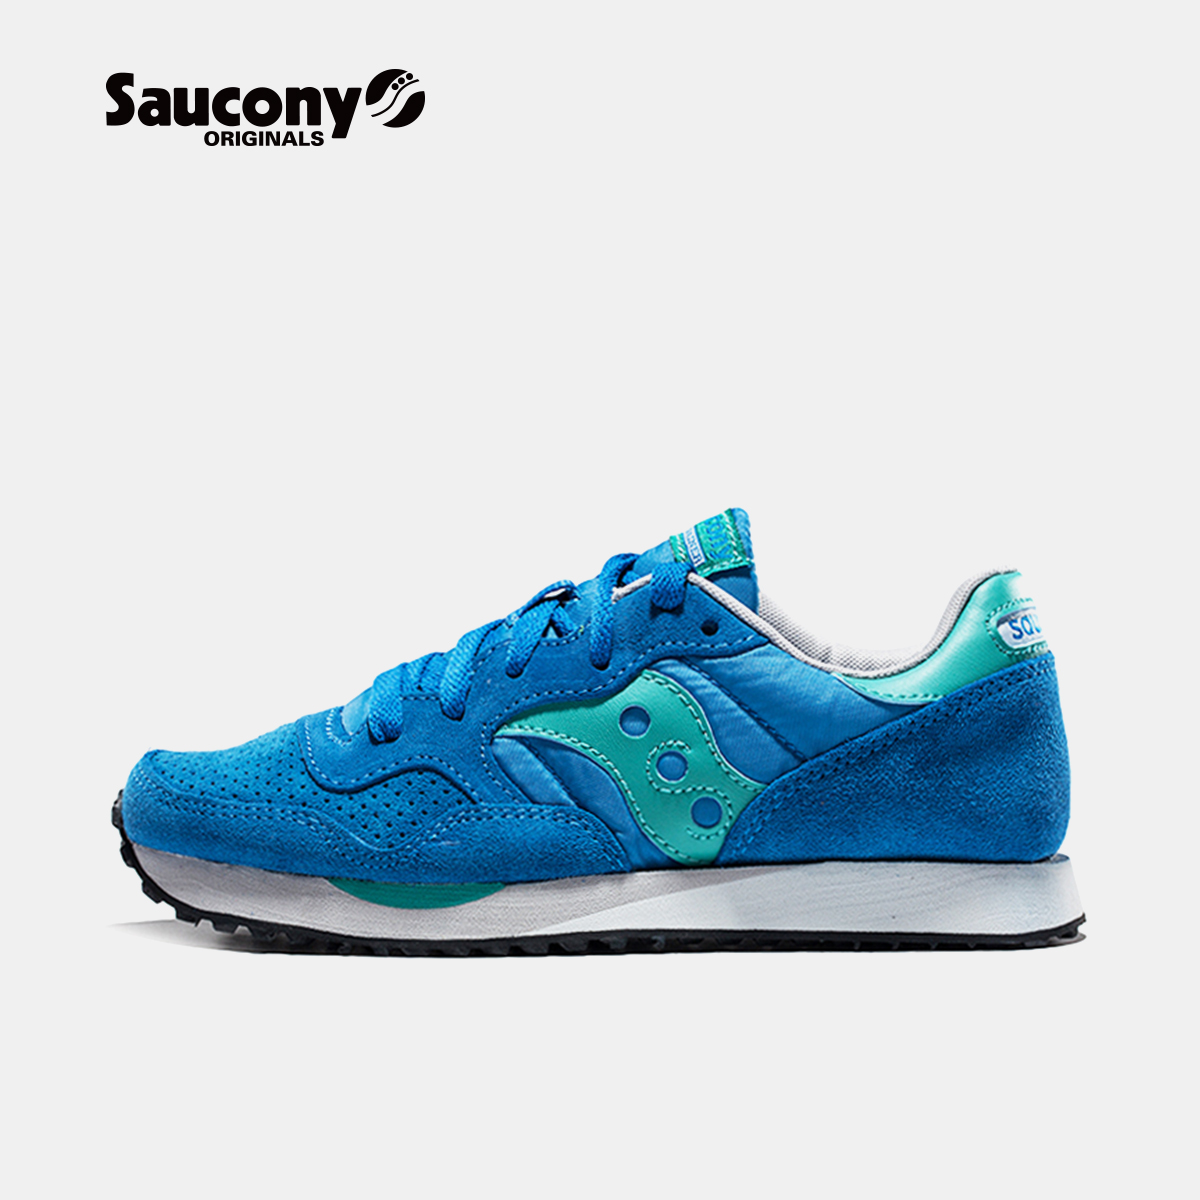 Saucony圣康尼 DXN TRAINER 复古跑鞋运动鞋女子跑步鞋S60124-A